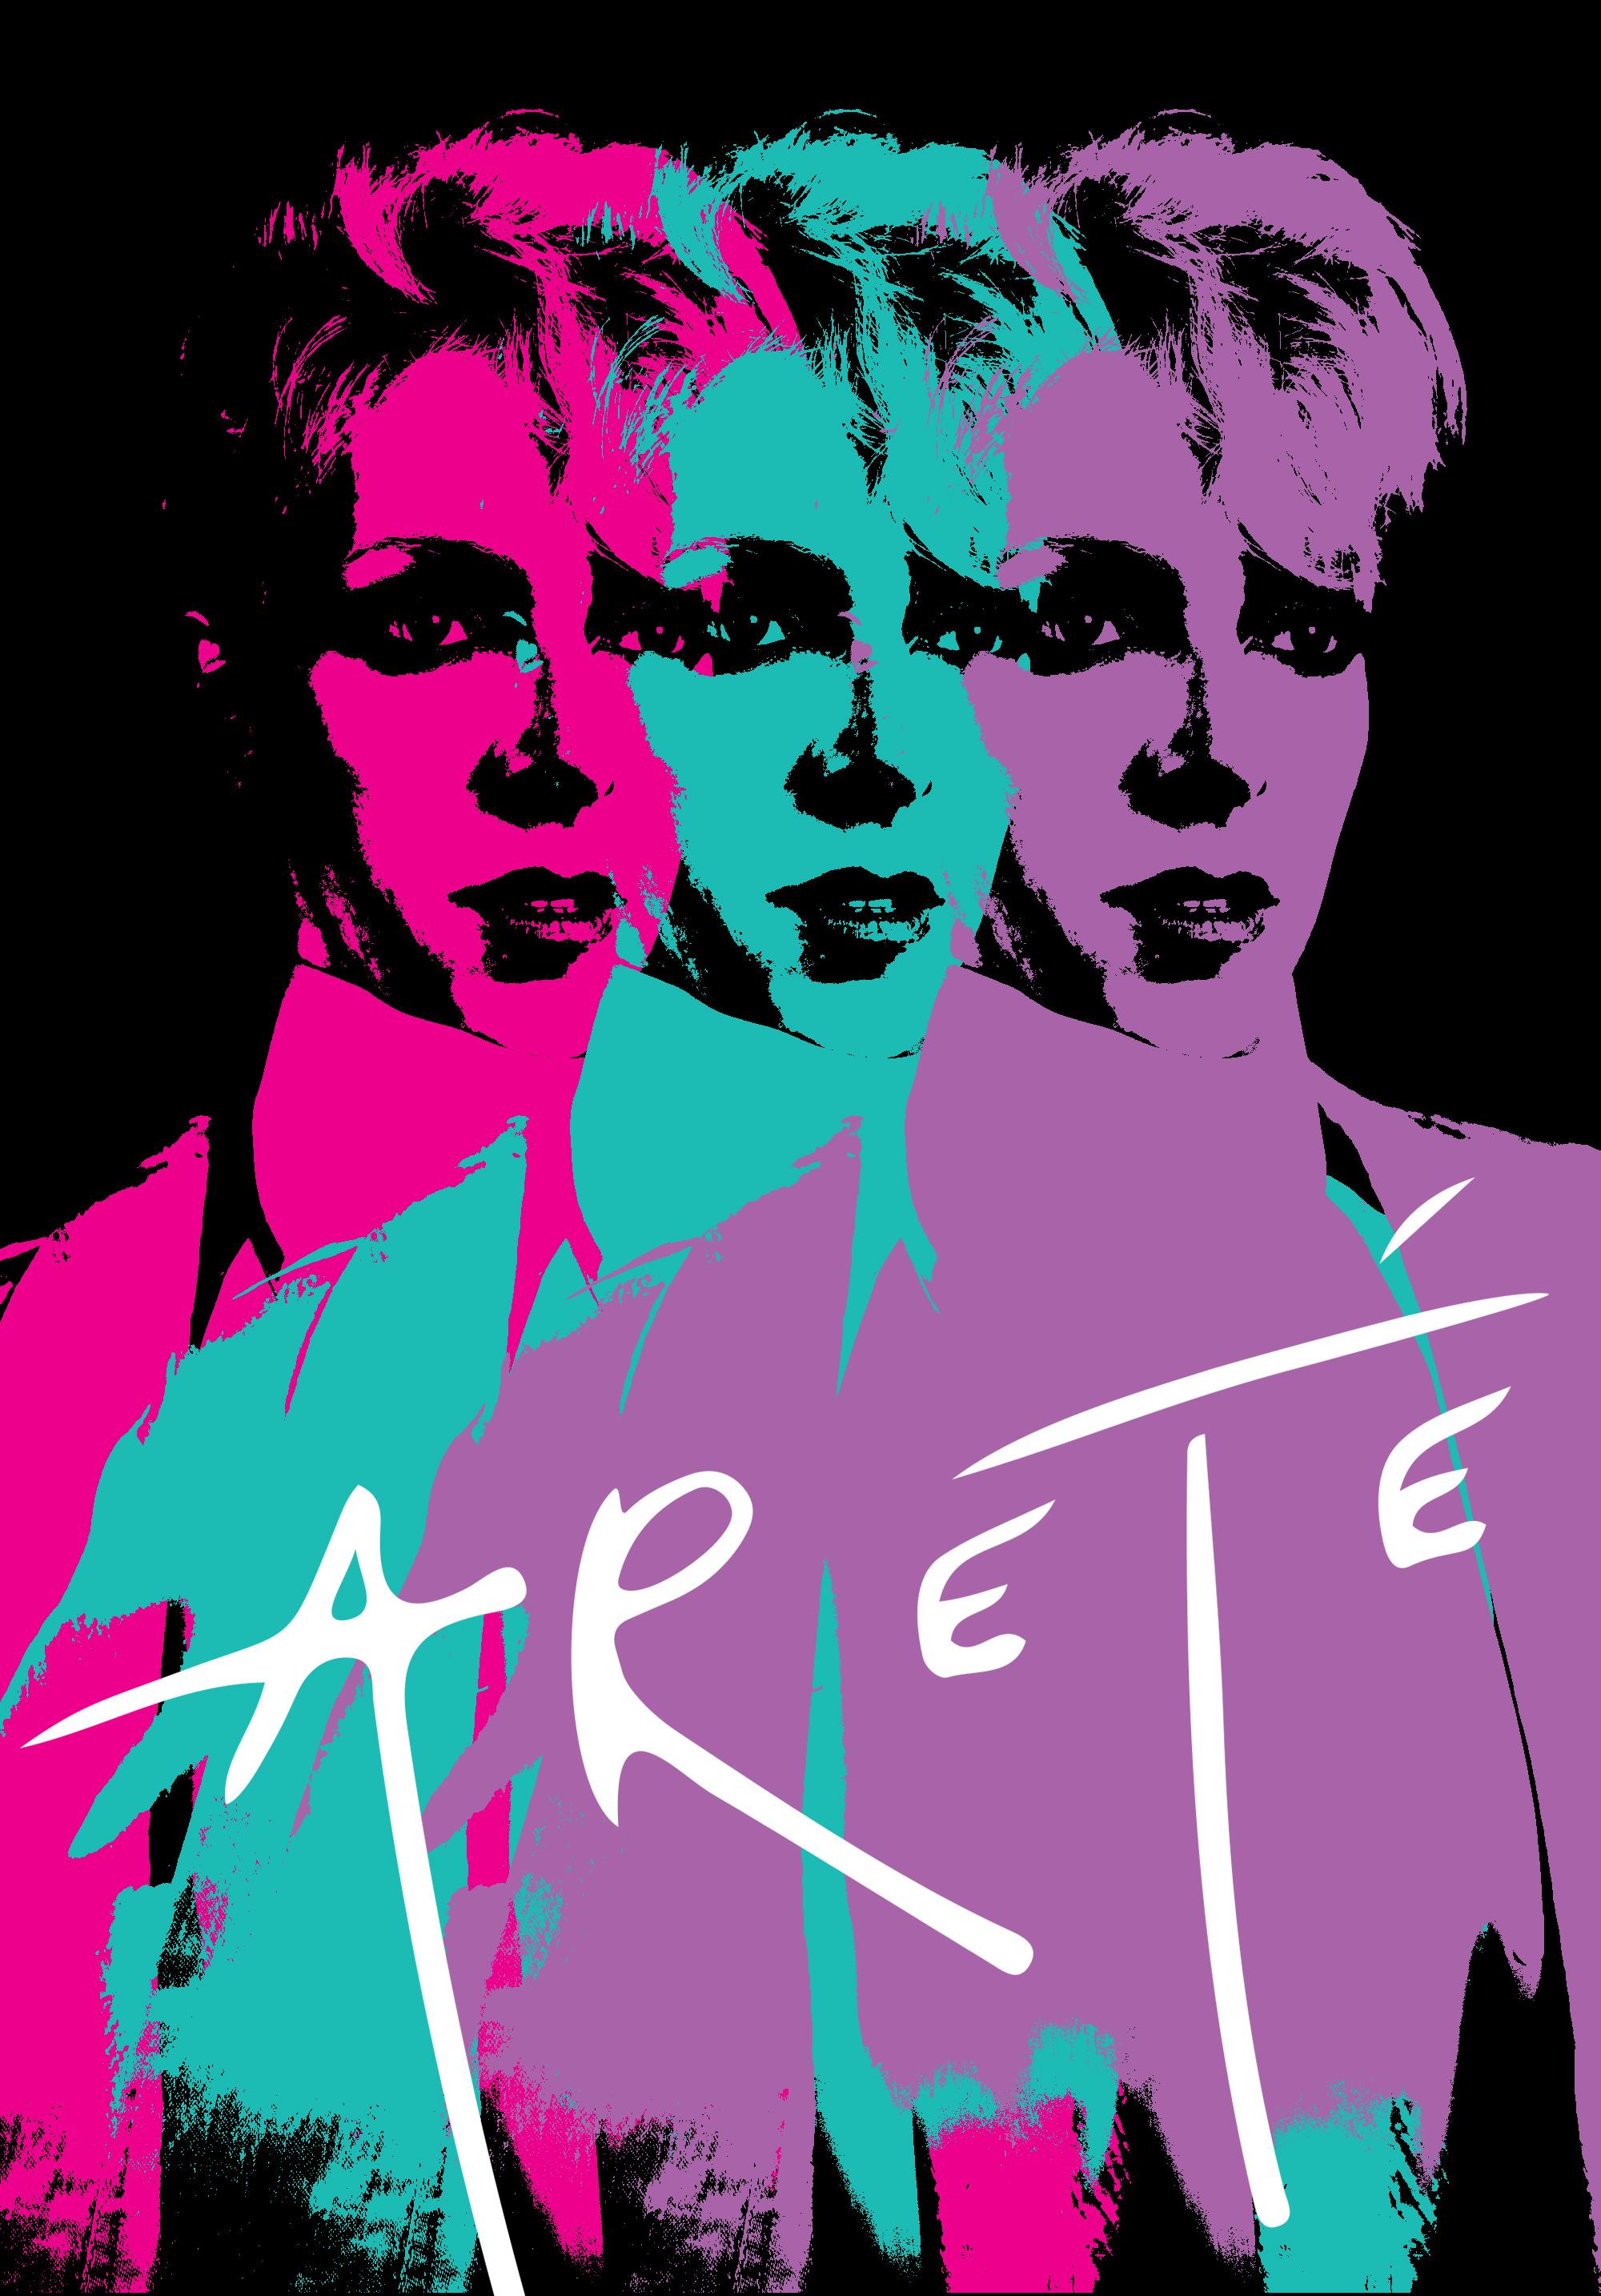 Arete-Poster-4.jpg